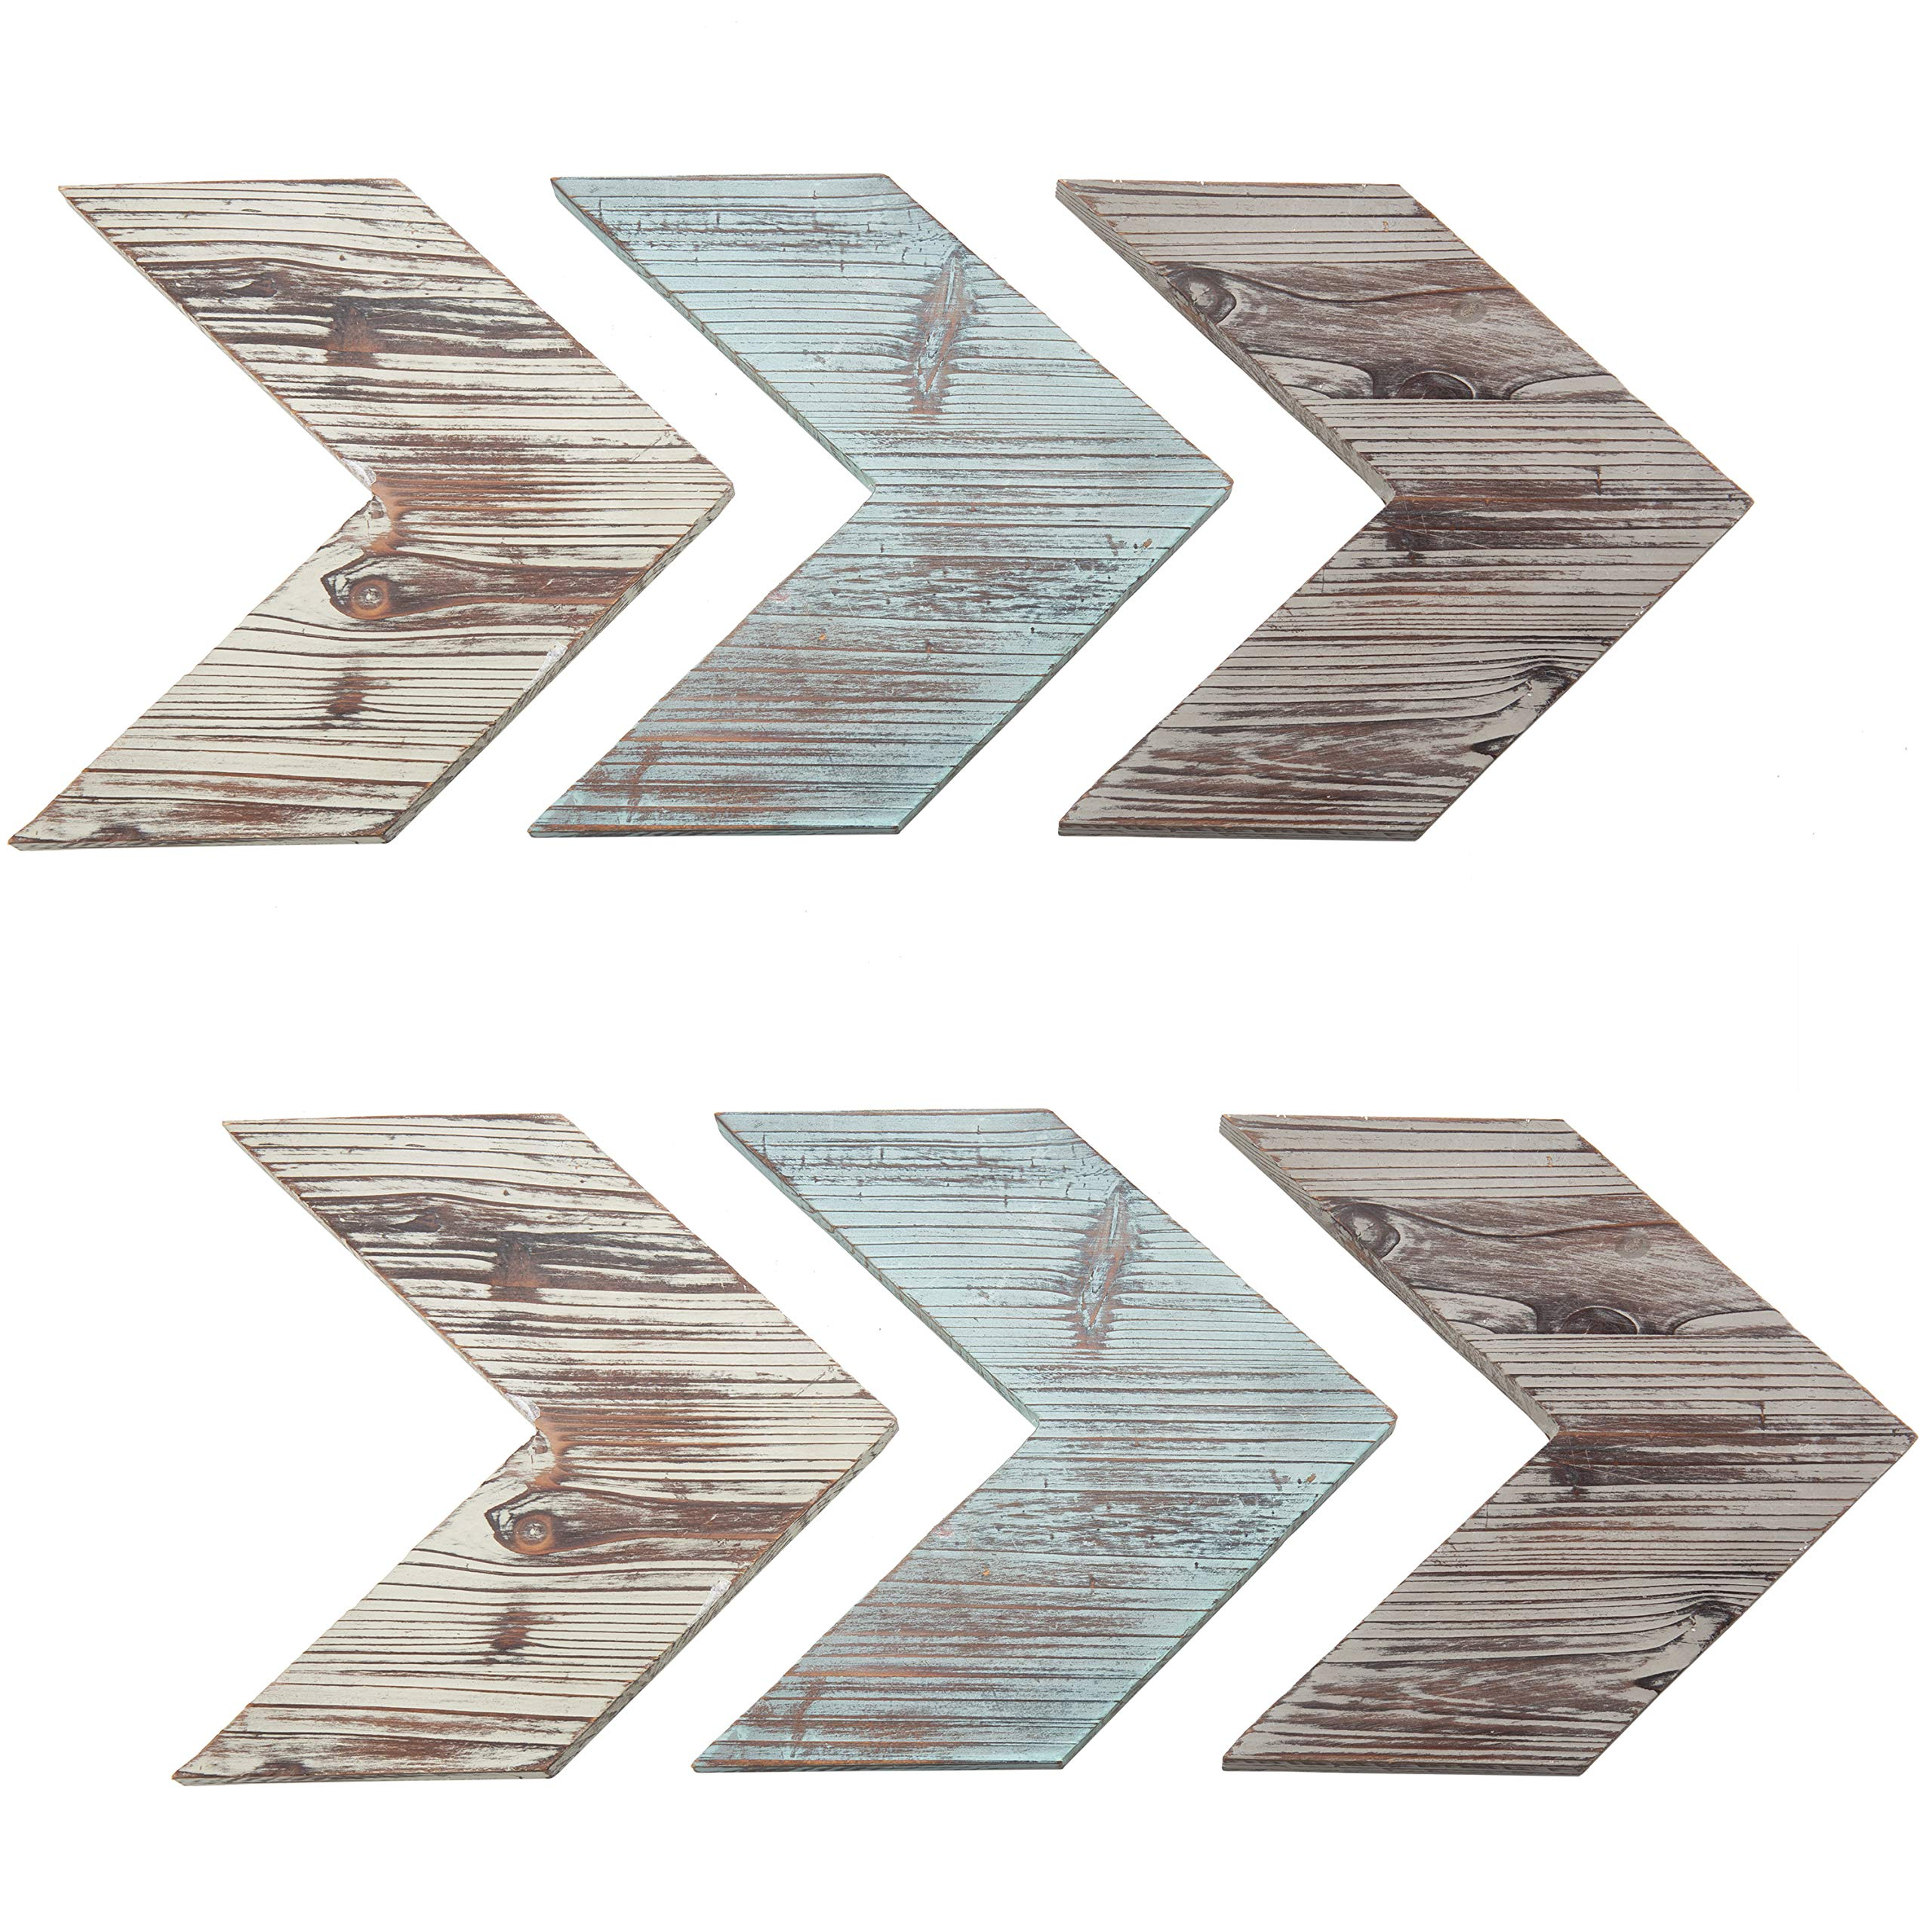 MyGift Rustic Wall-Mounted Wood Chevrons, Arrow Wall Decor, 6-Piece Set